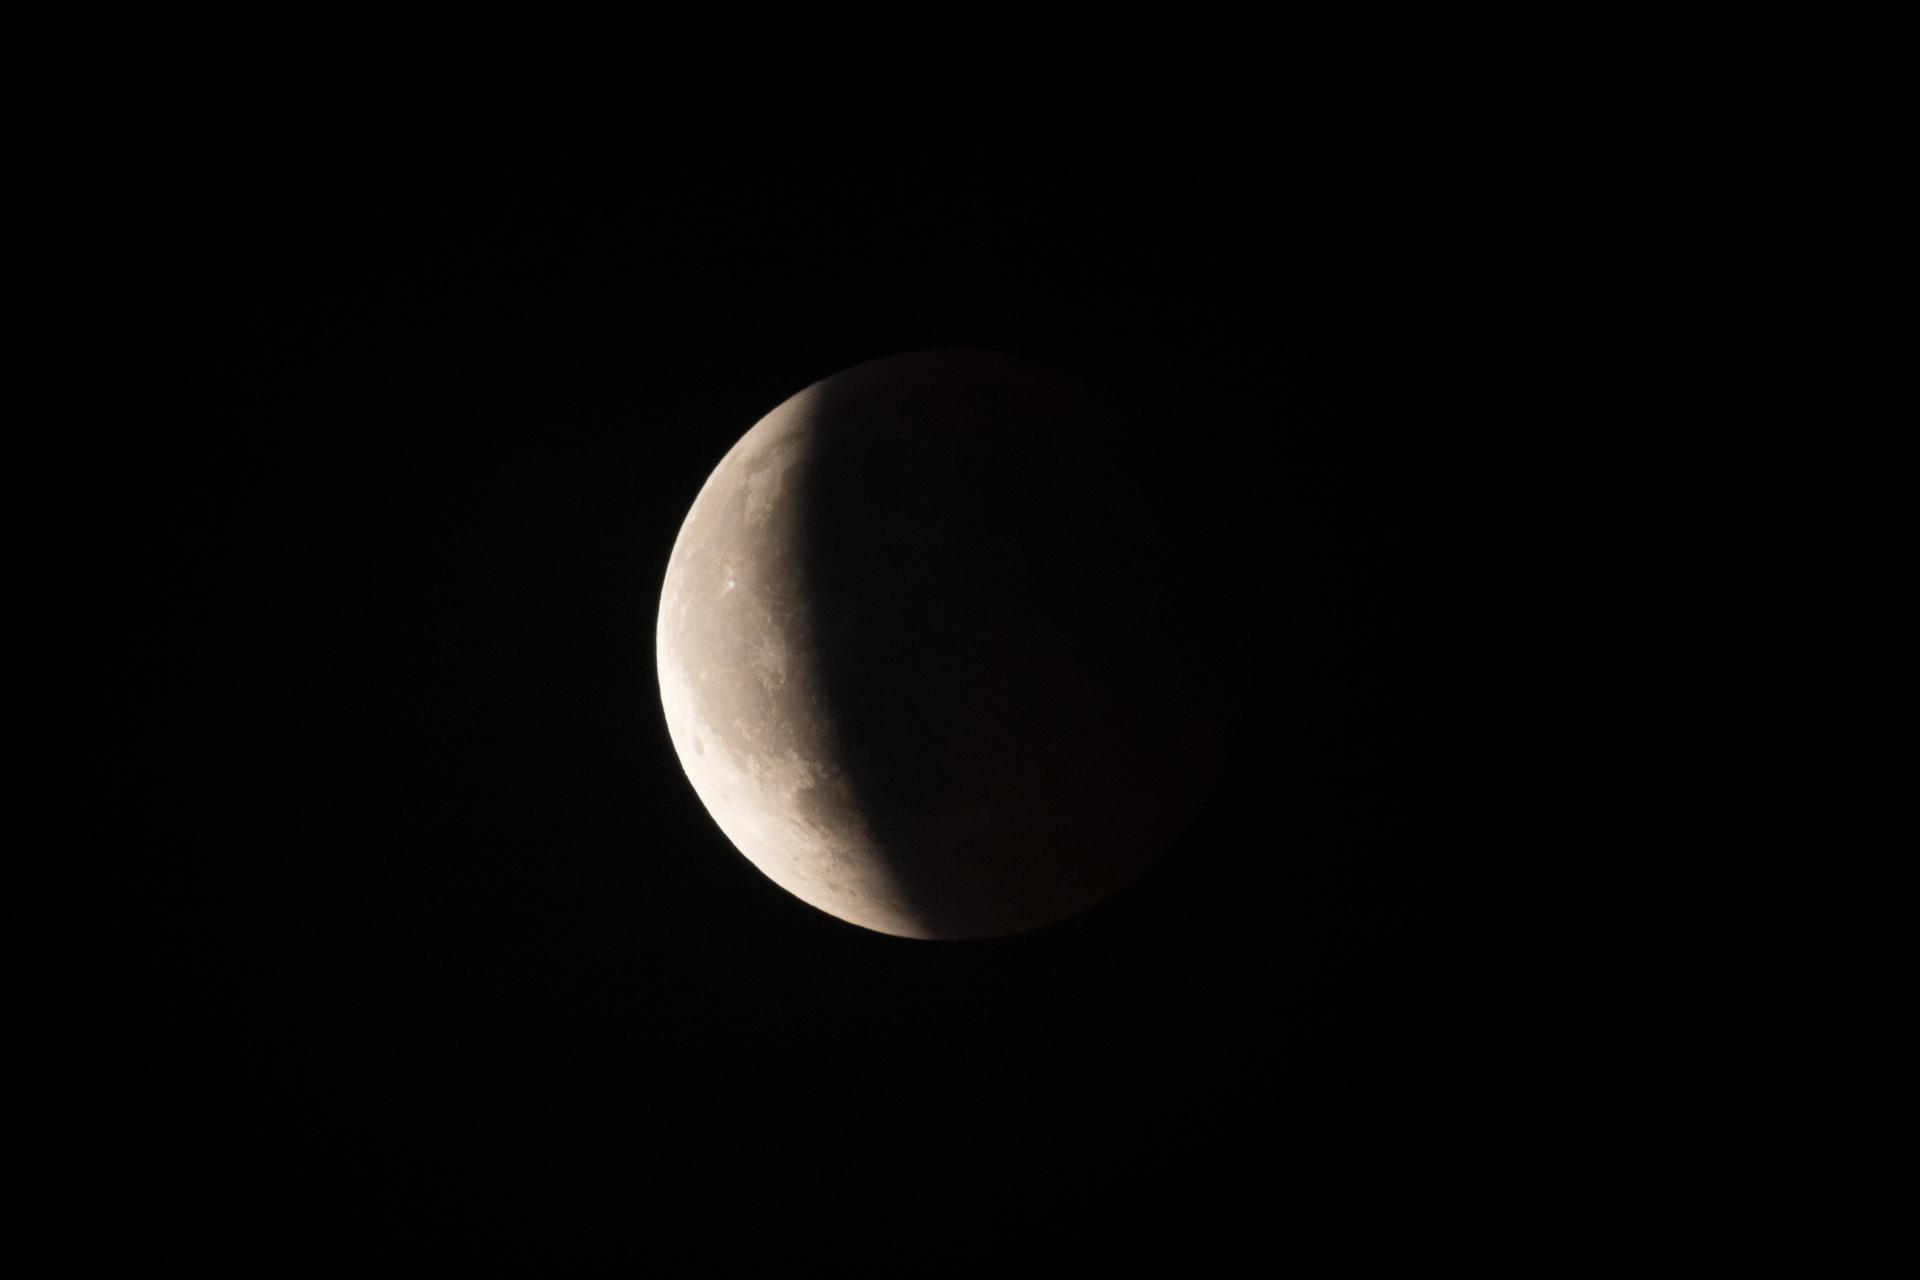 20180727_LunarEclipse-9